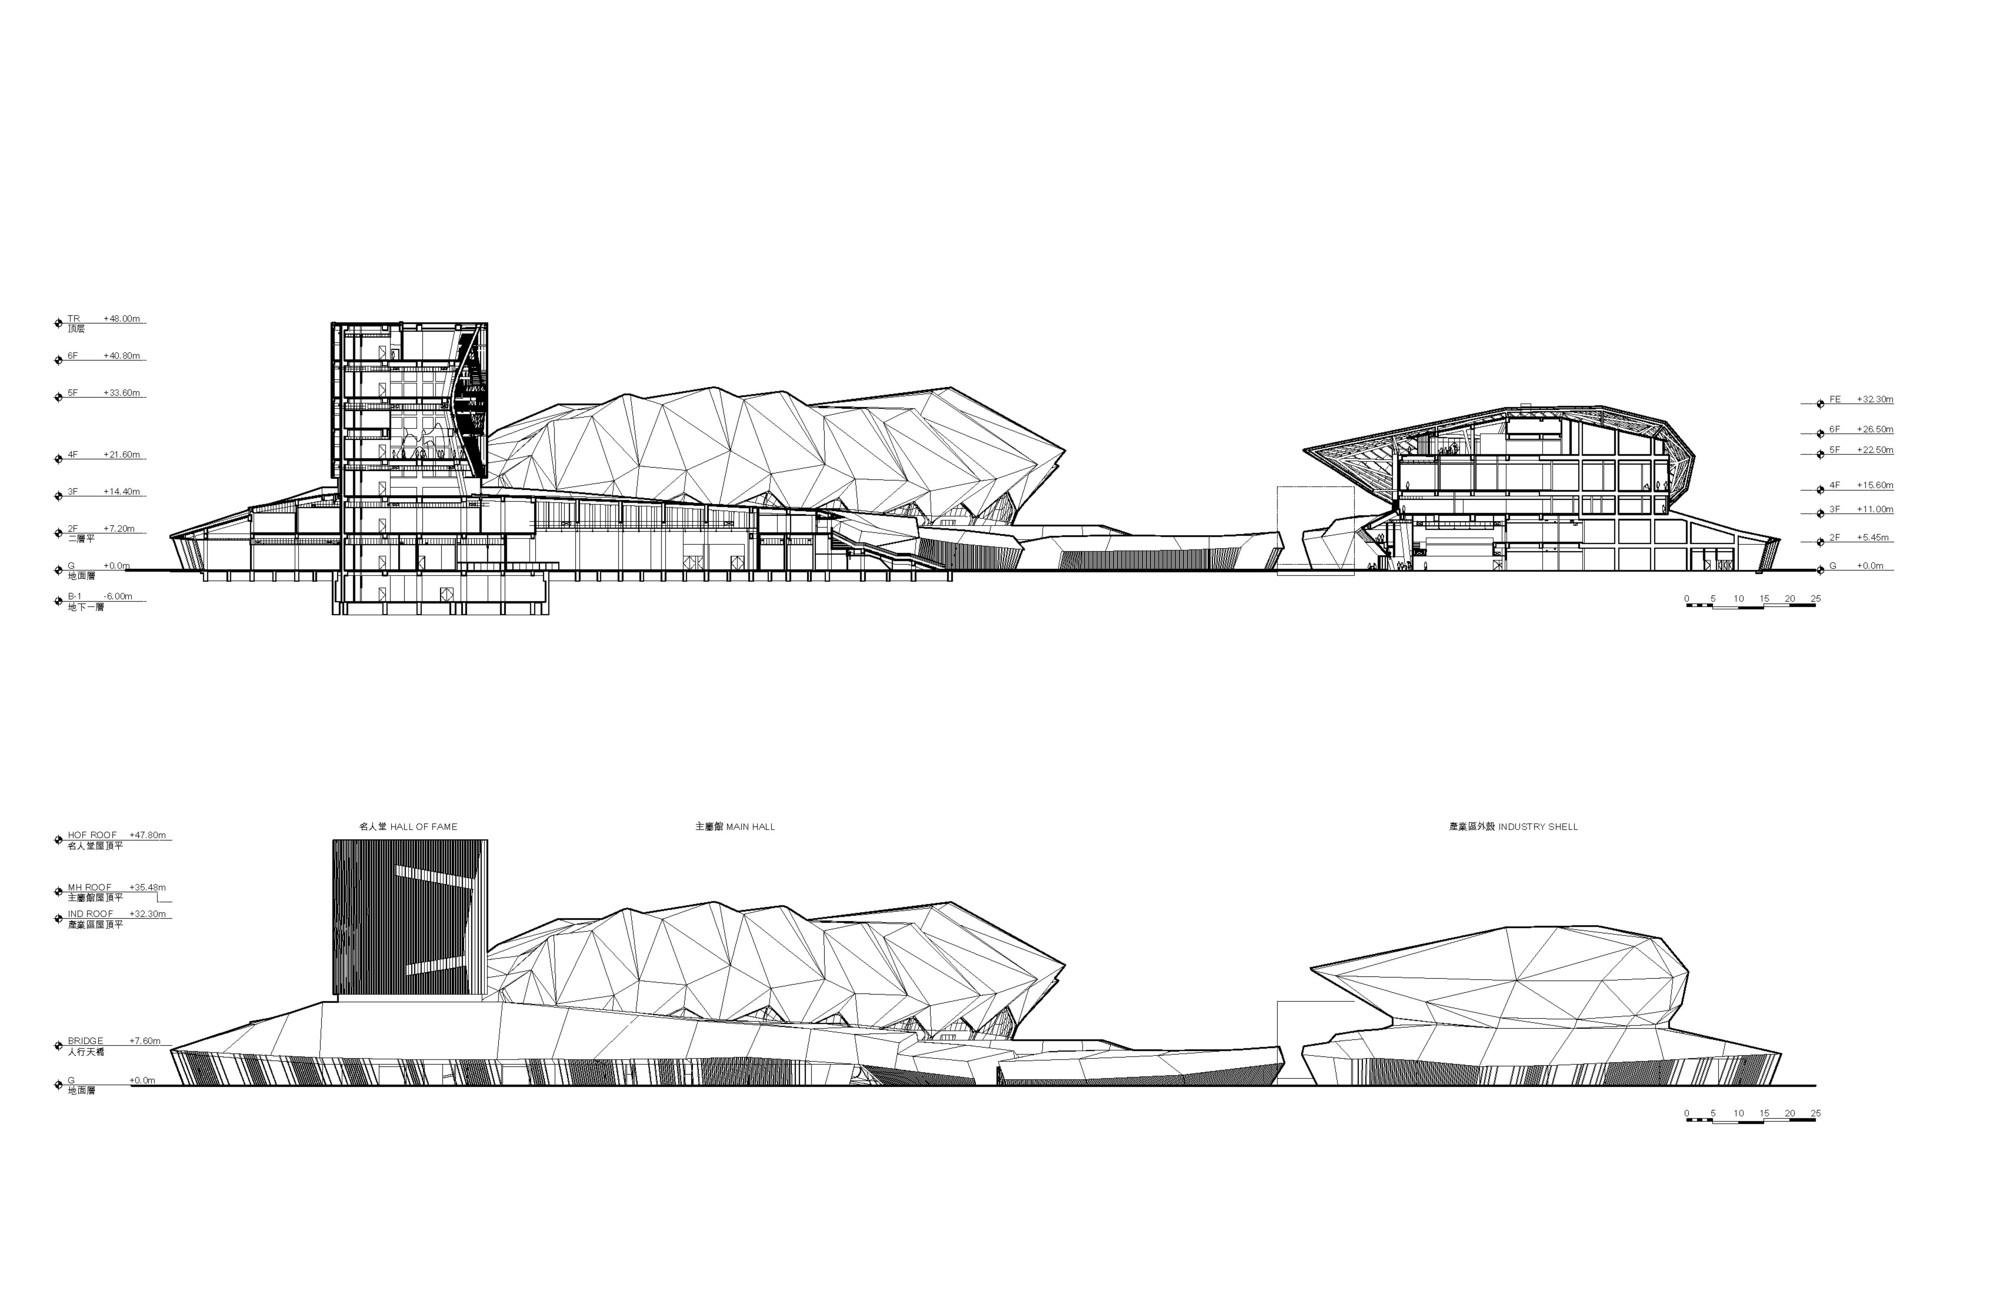 Ping Complex Plan Elevation Section : Gallery of reiser umemoto s taipei pop music center